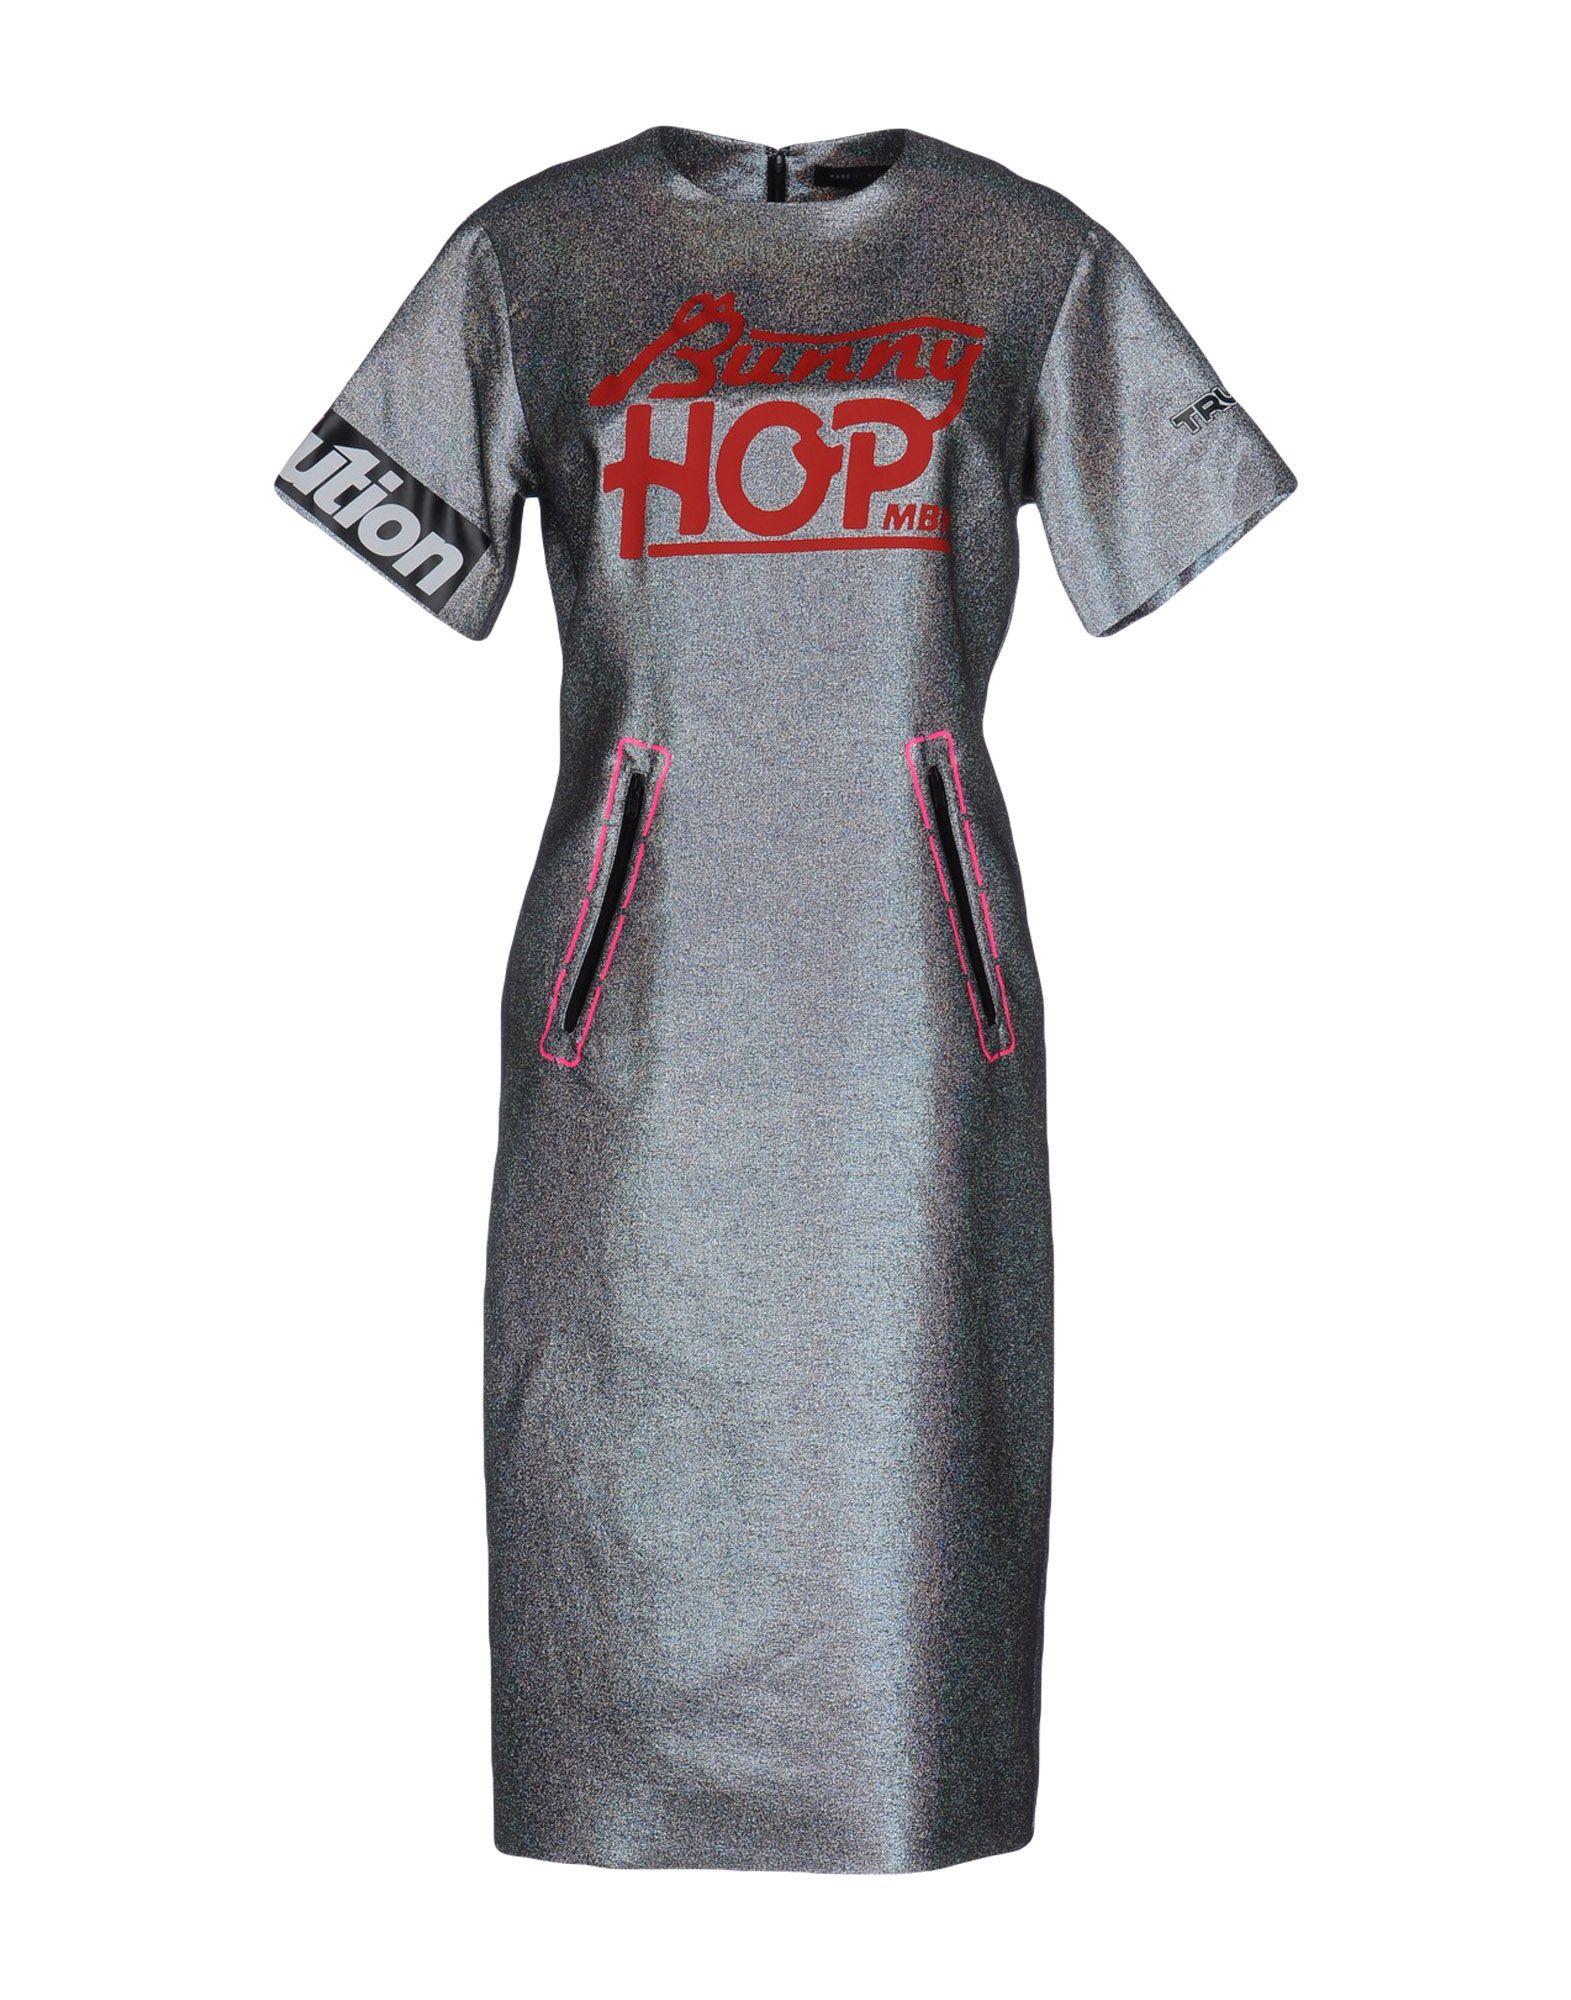 MARC BY MARC JACOBS Платье до колена цены